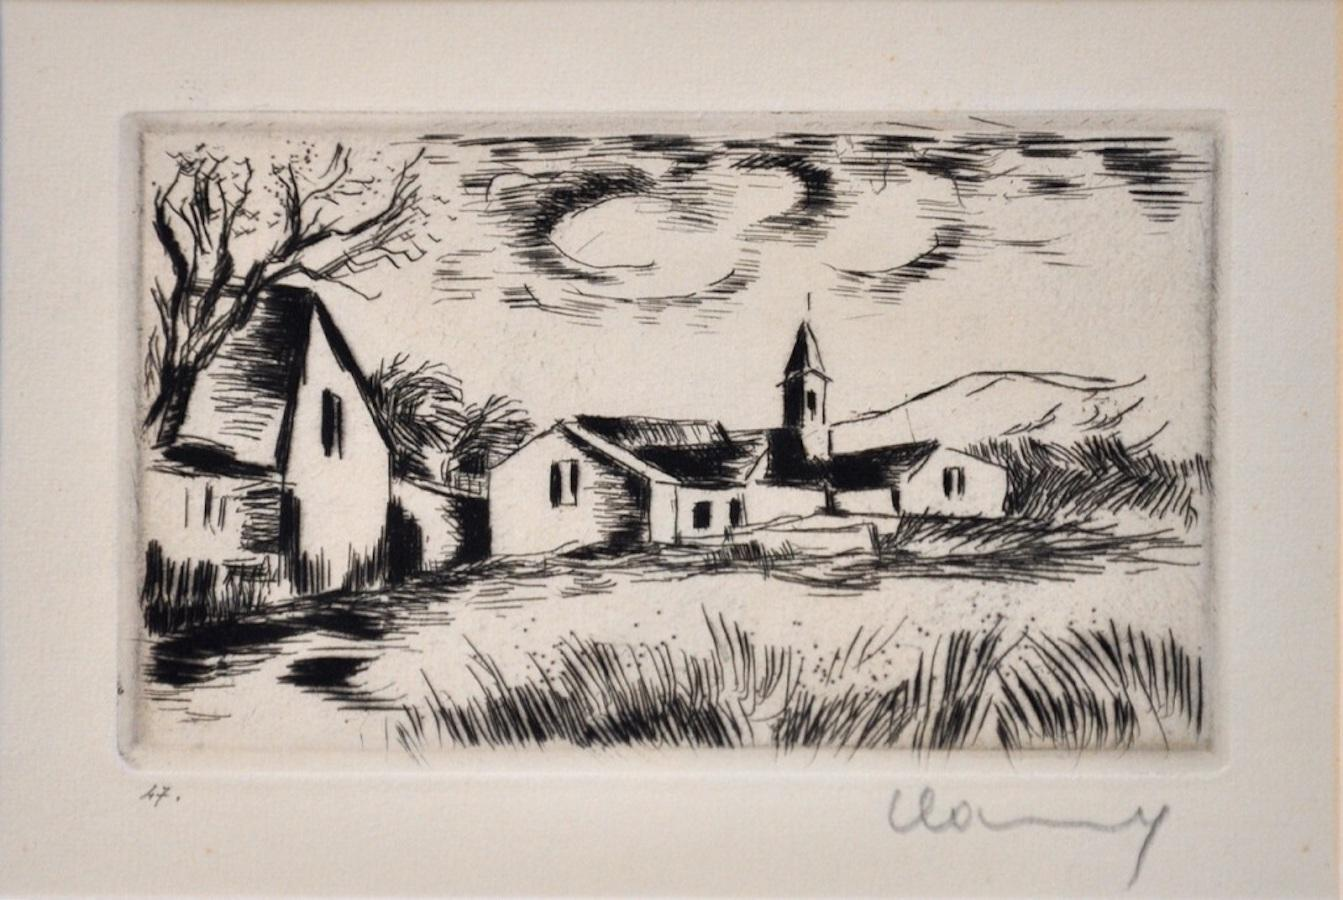 Landscape with Bell Tower - Original Etching by M. de Vlaminck - 1930s